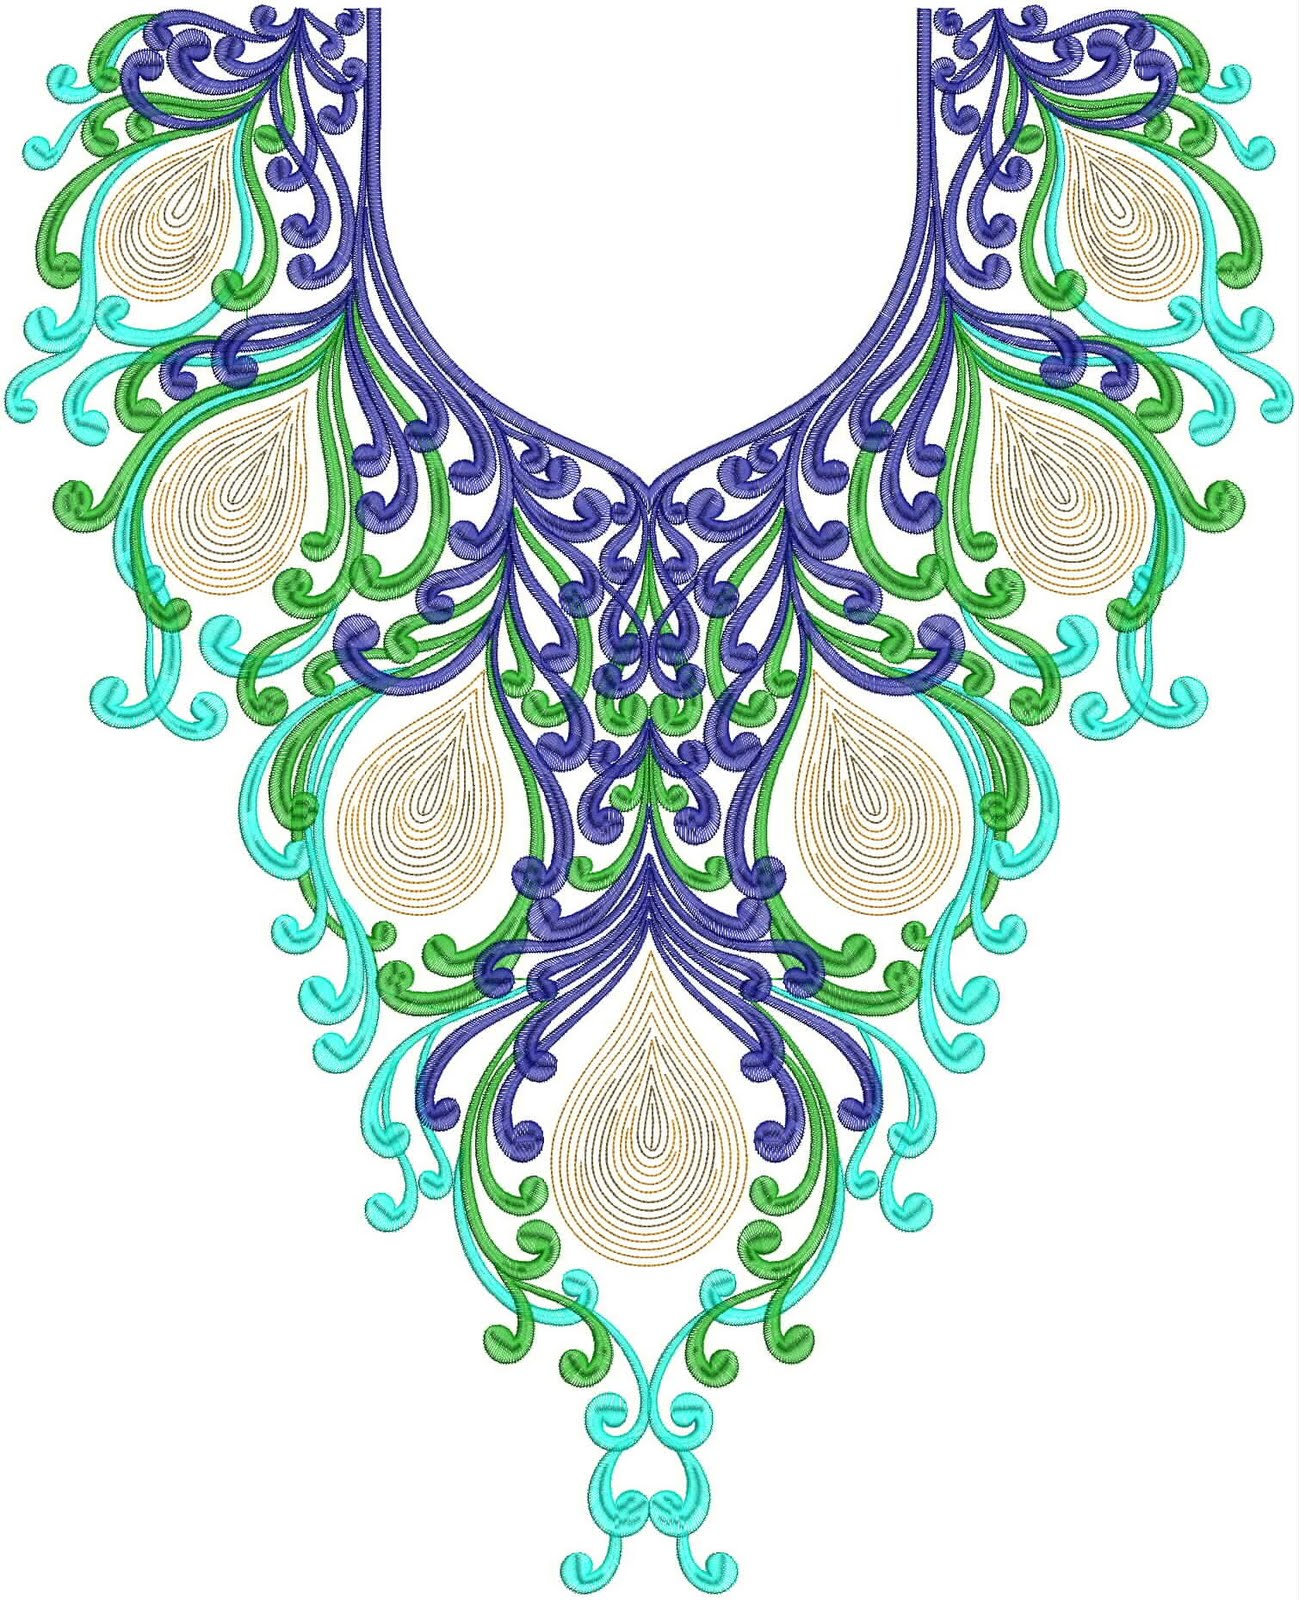 Lace Neckline Embroidery Designs